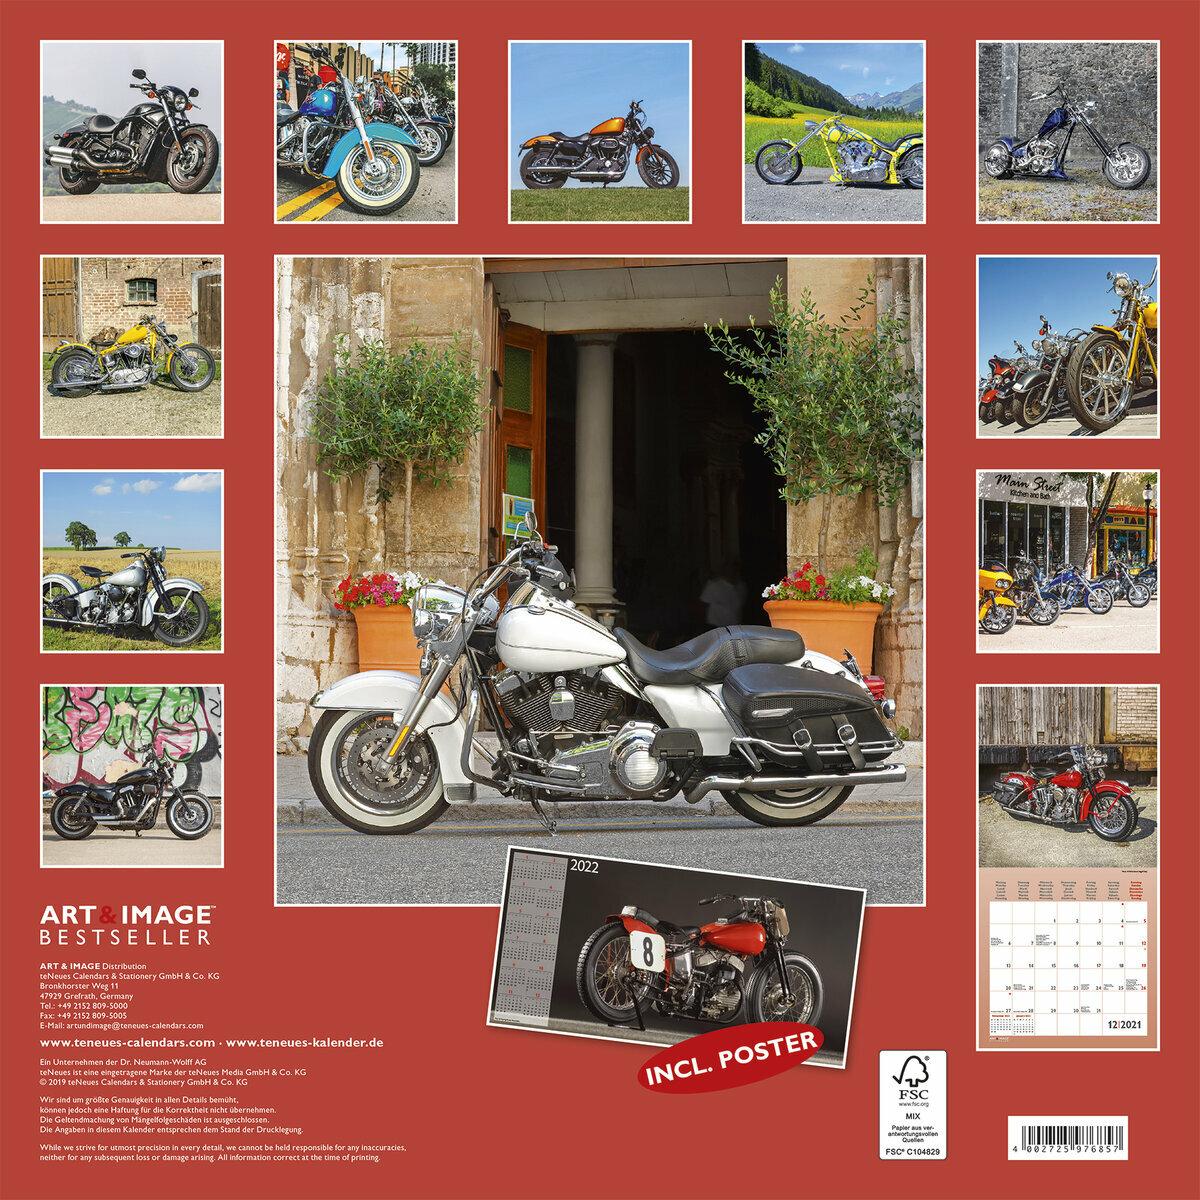 Calendrier 2021 Harley Davidson avec poster offert